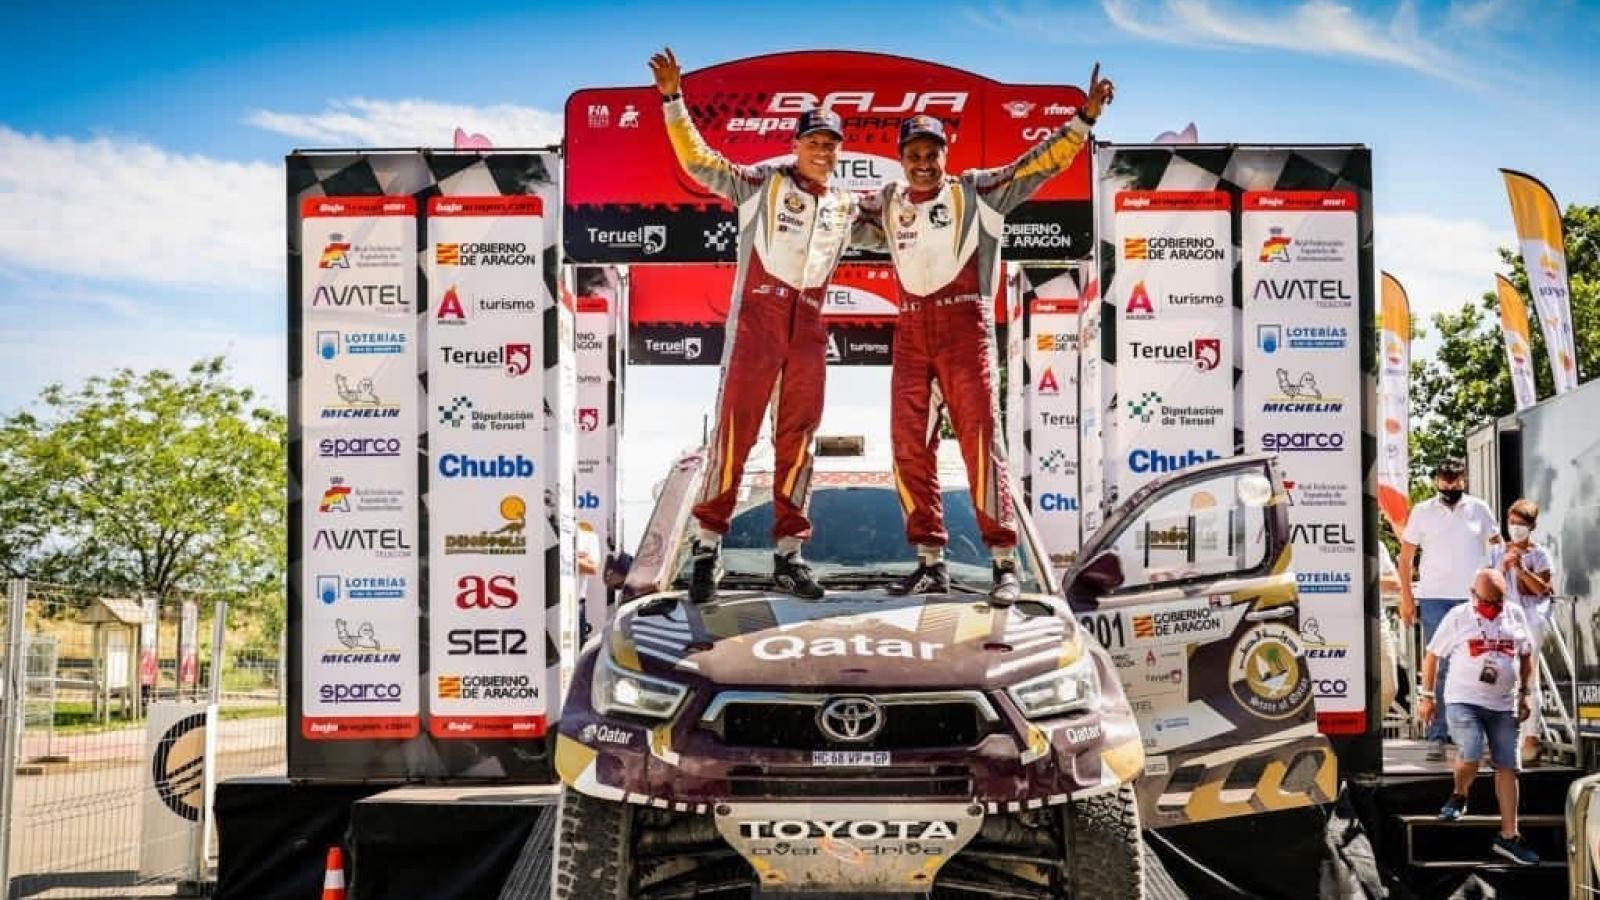 Qatari champion Nasser Saleh Al Attiyah secures victory at Baja Spain Aragon